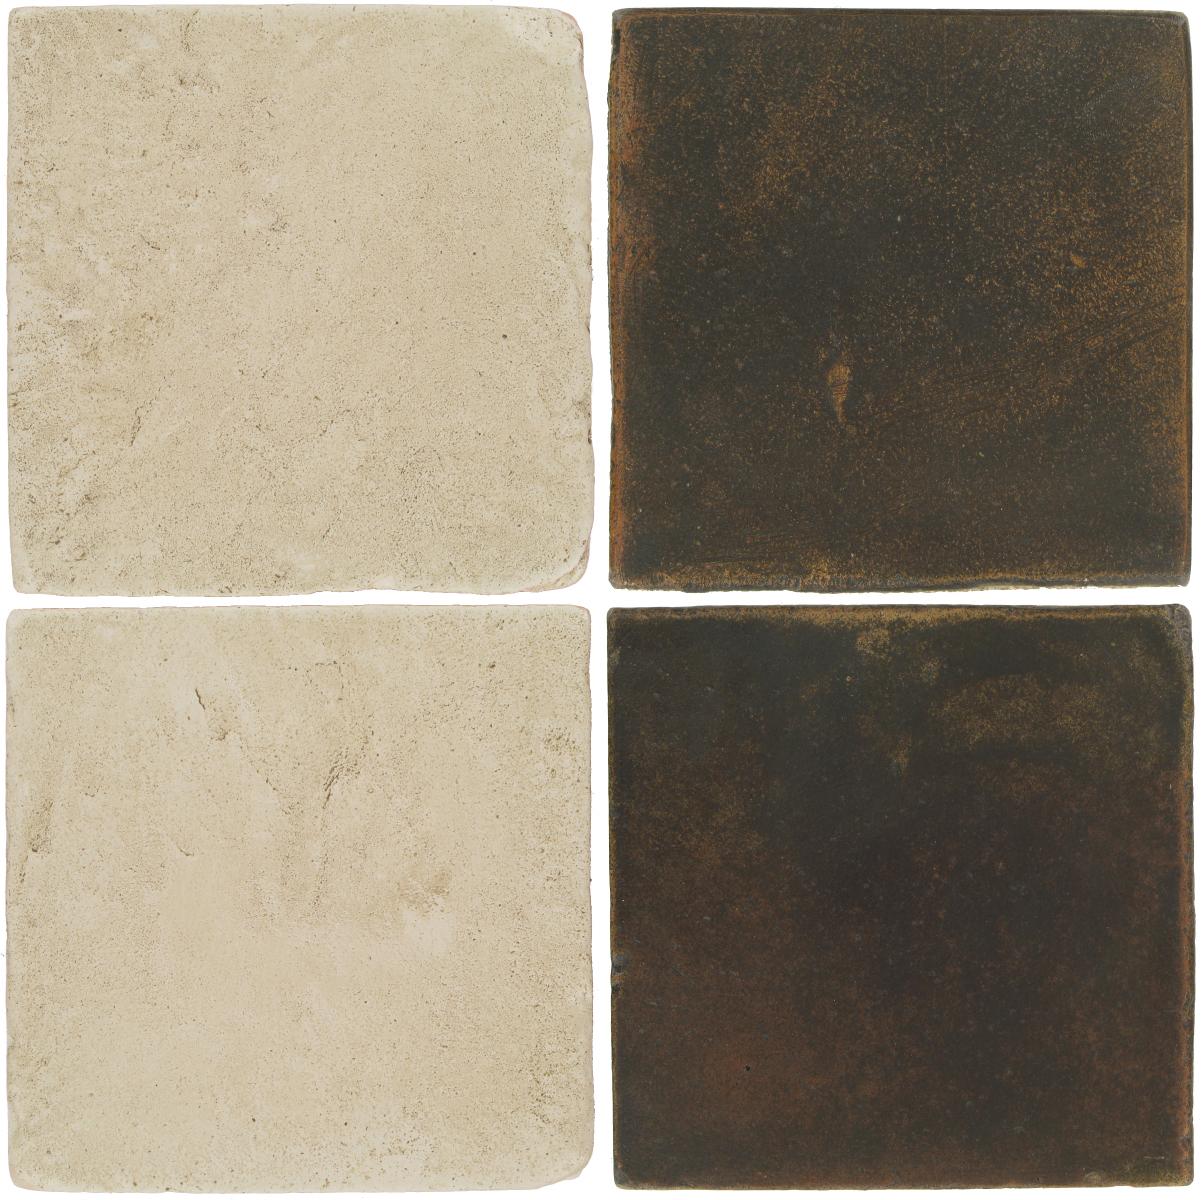 Pedralbes Antique Terracotta  2 Color Combinations  VTG-PGLW Glacier White + OHS-PSCO Cologne Brown